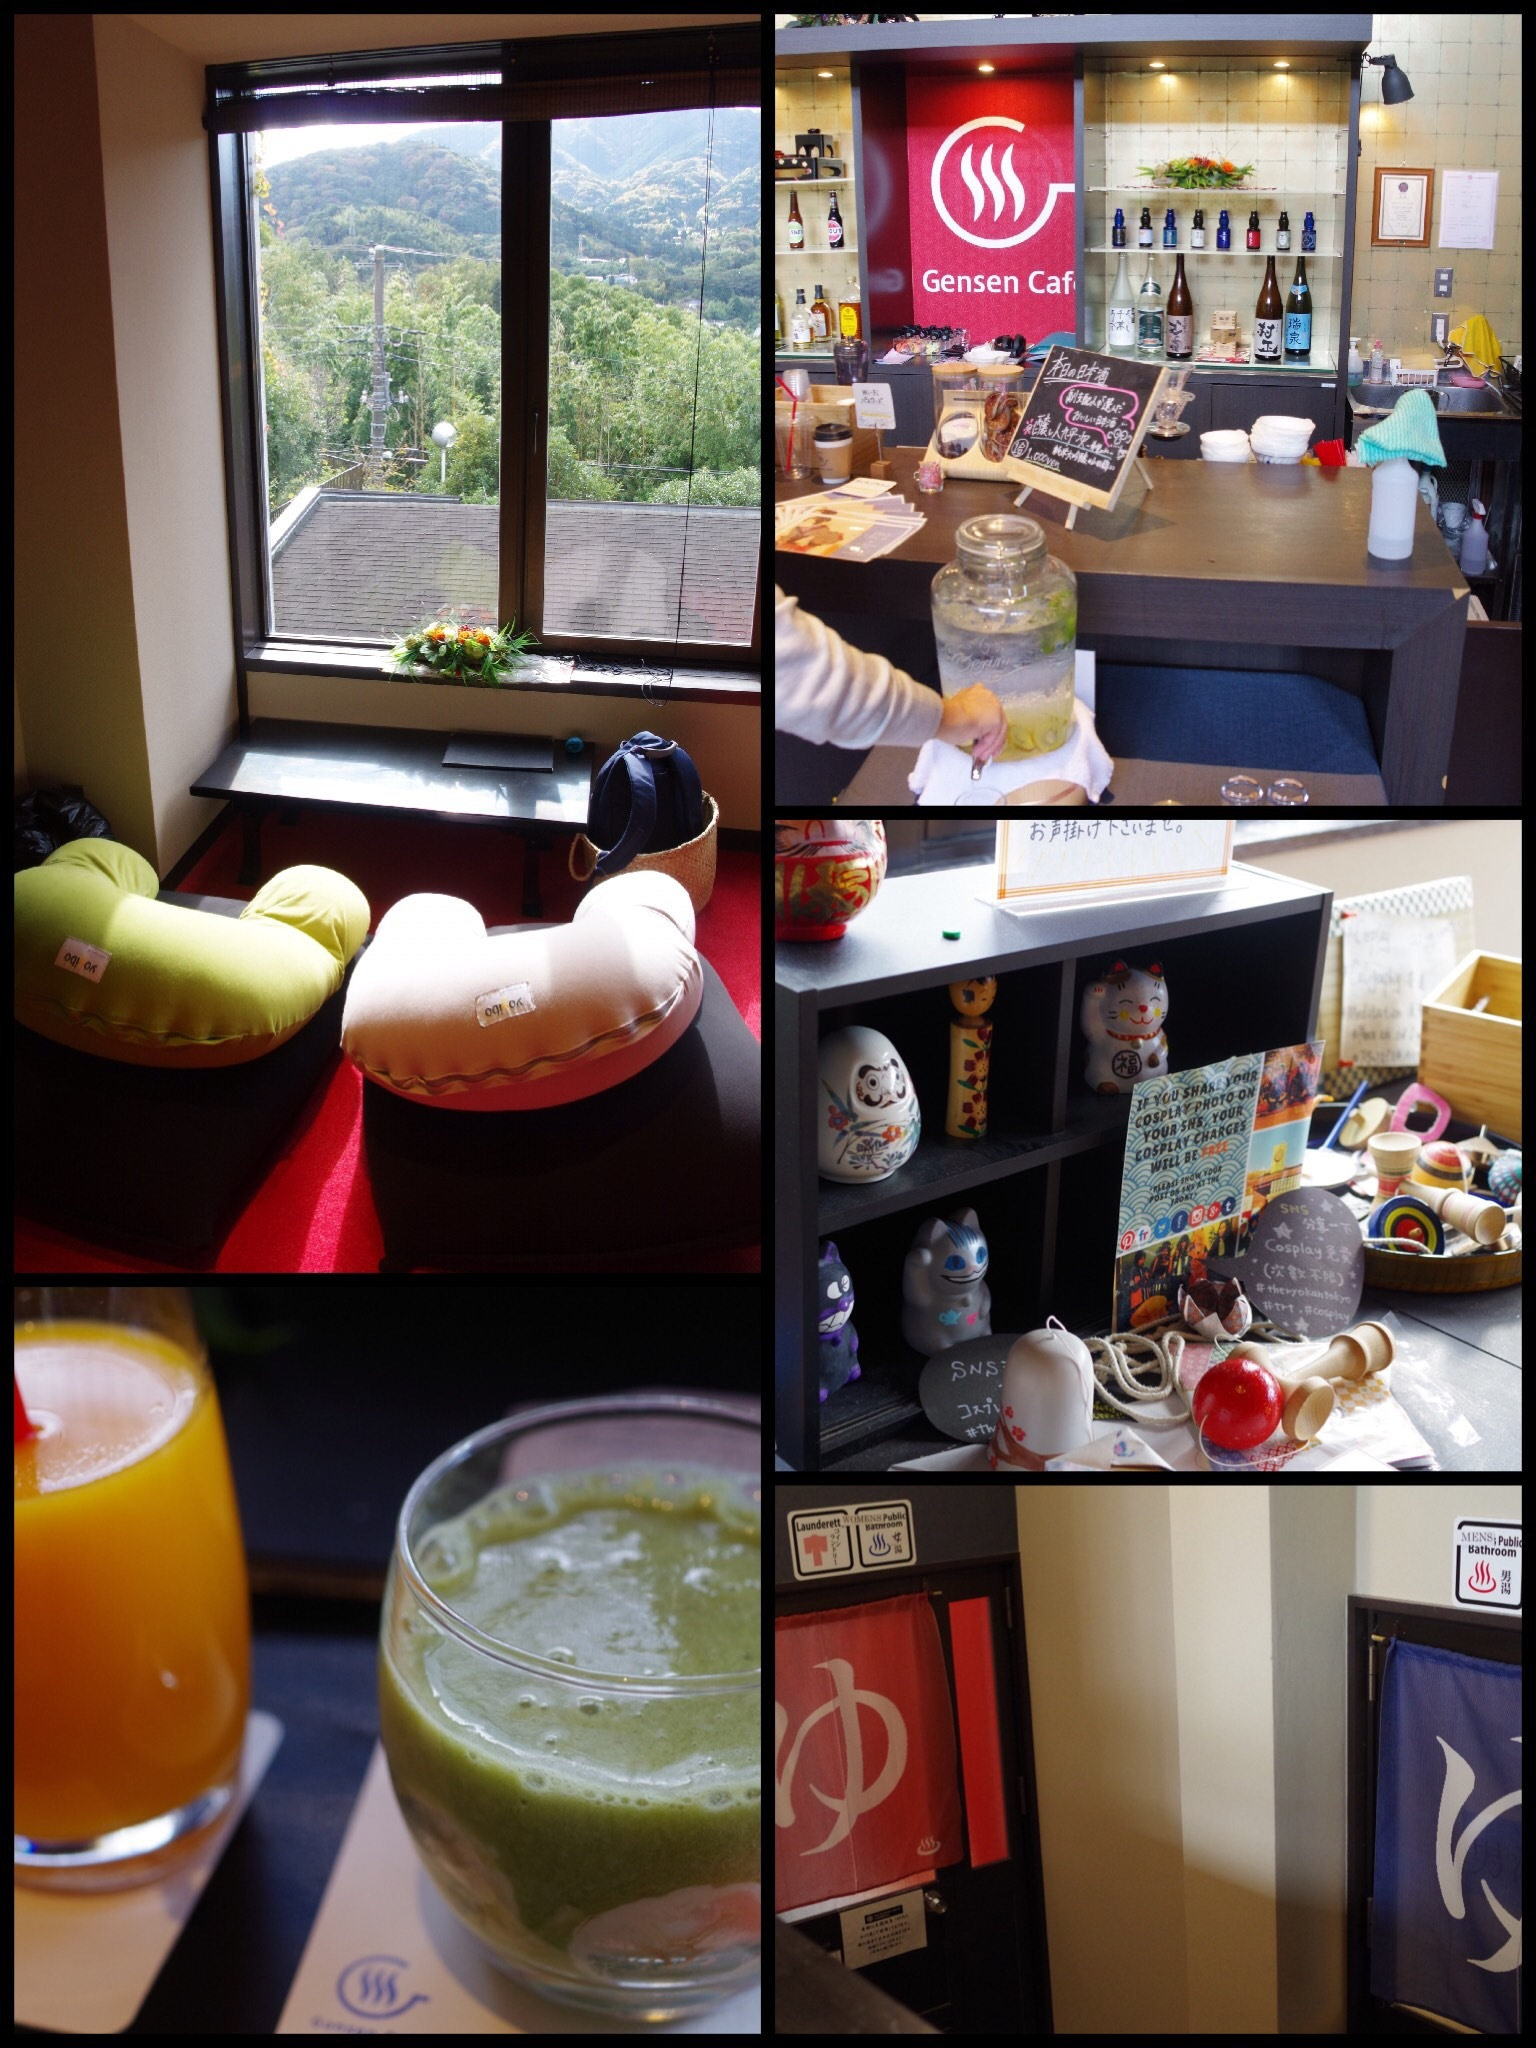 Gensen cafe the ryokan Tokyo 湯河原 源泉カフェ Yugawara